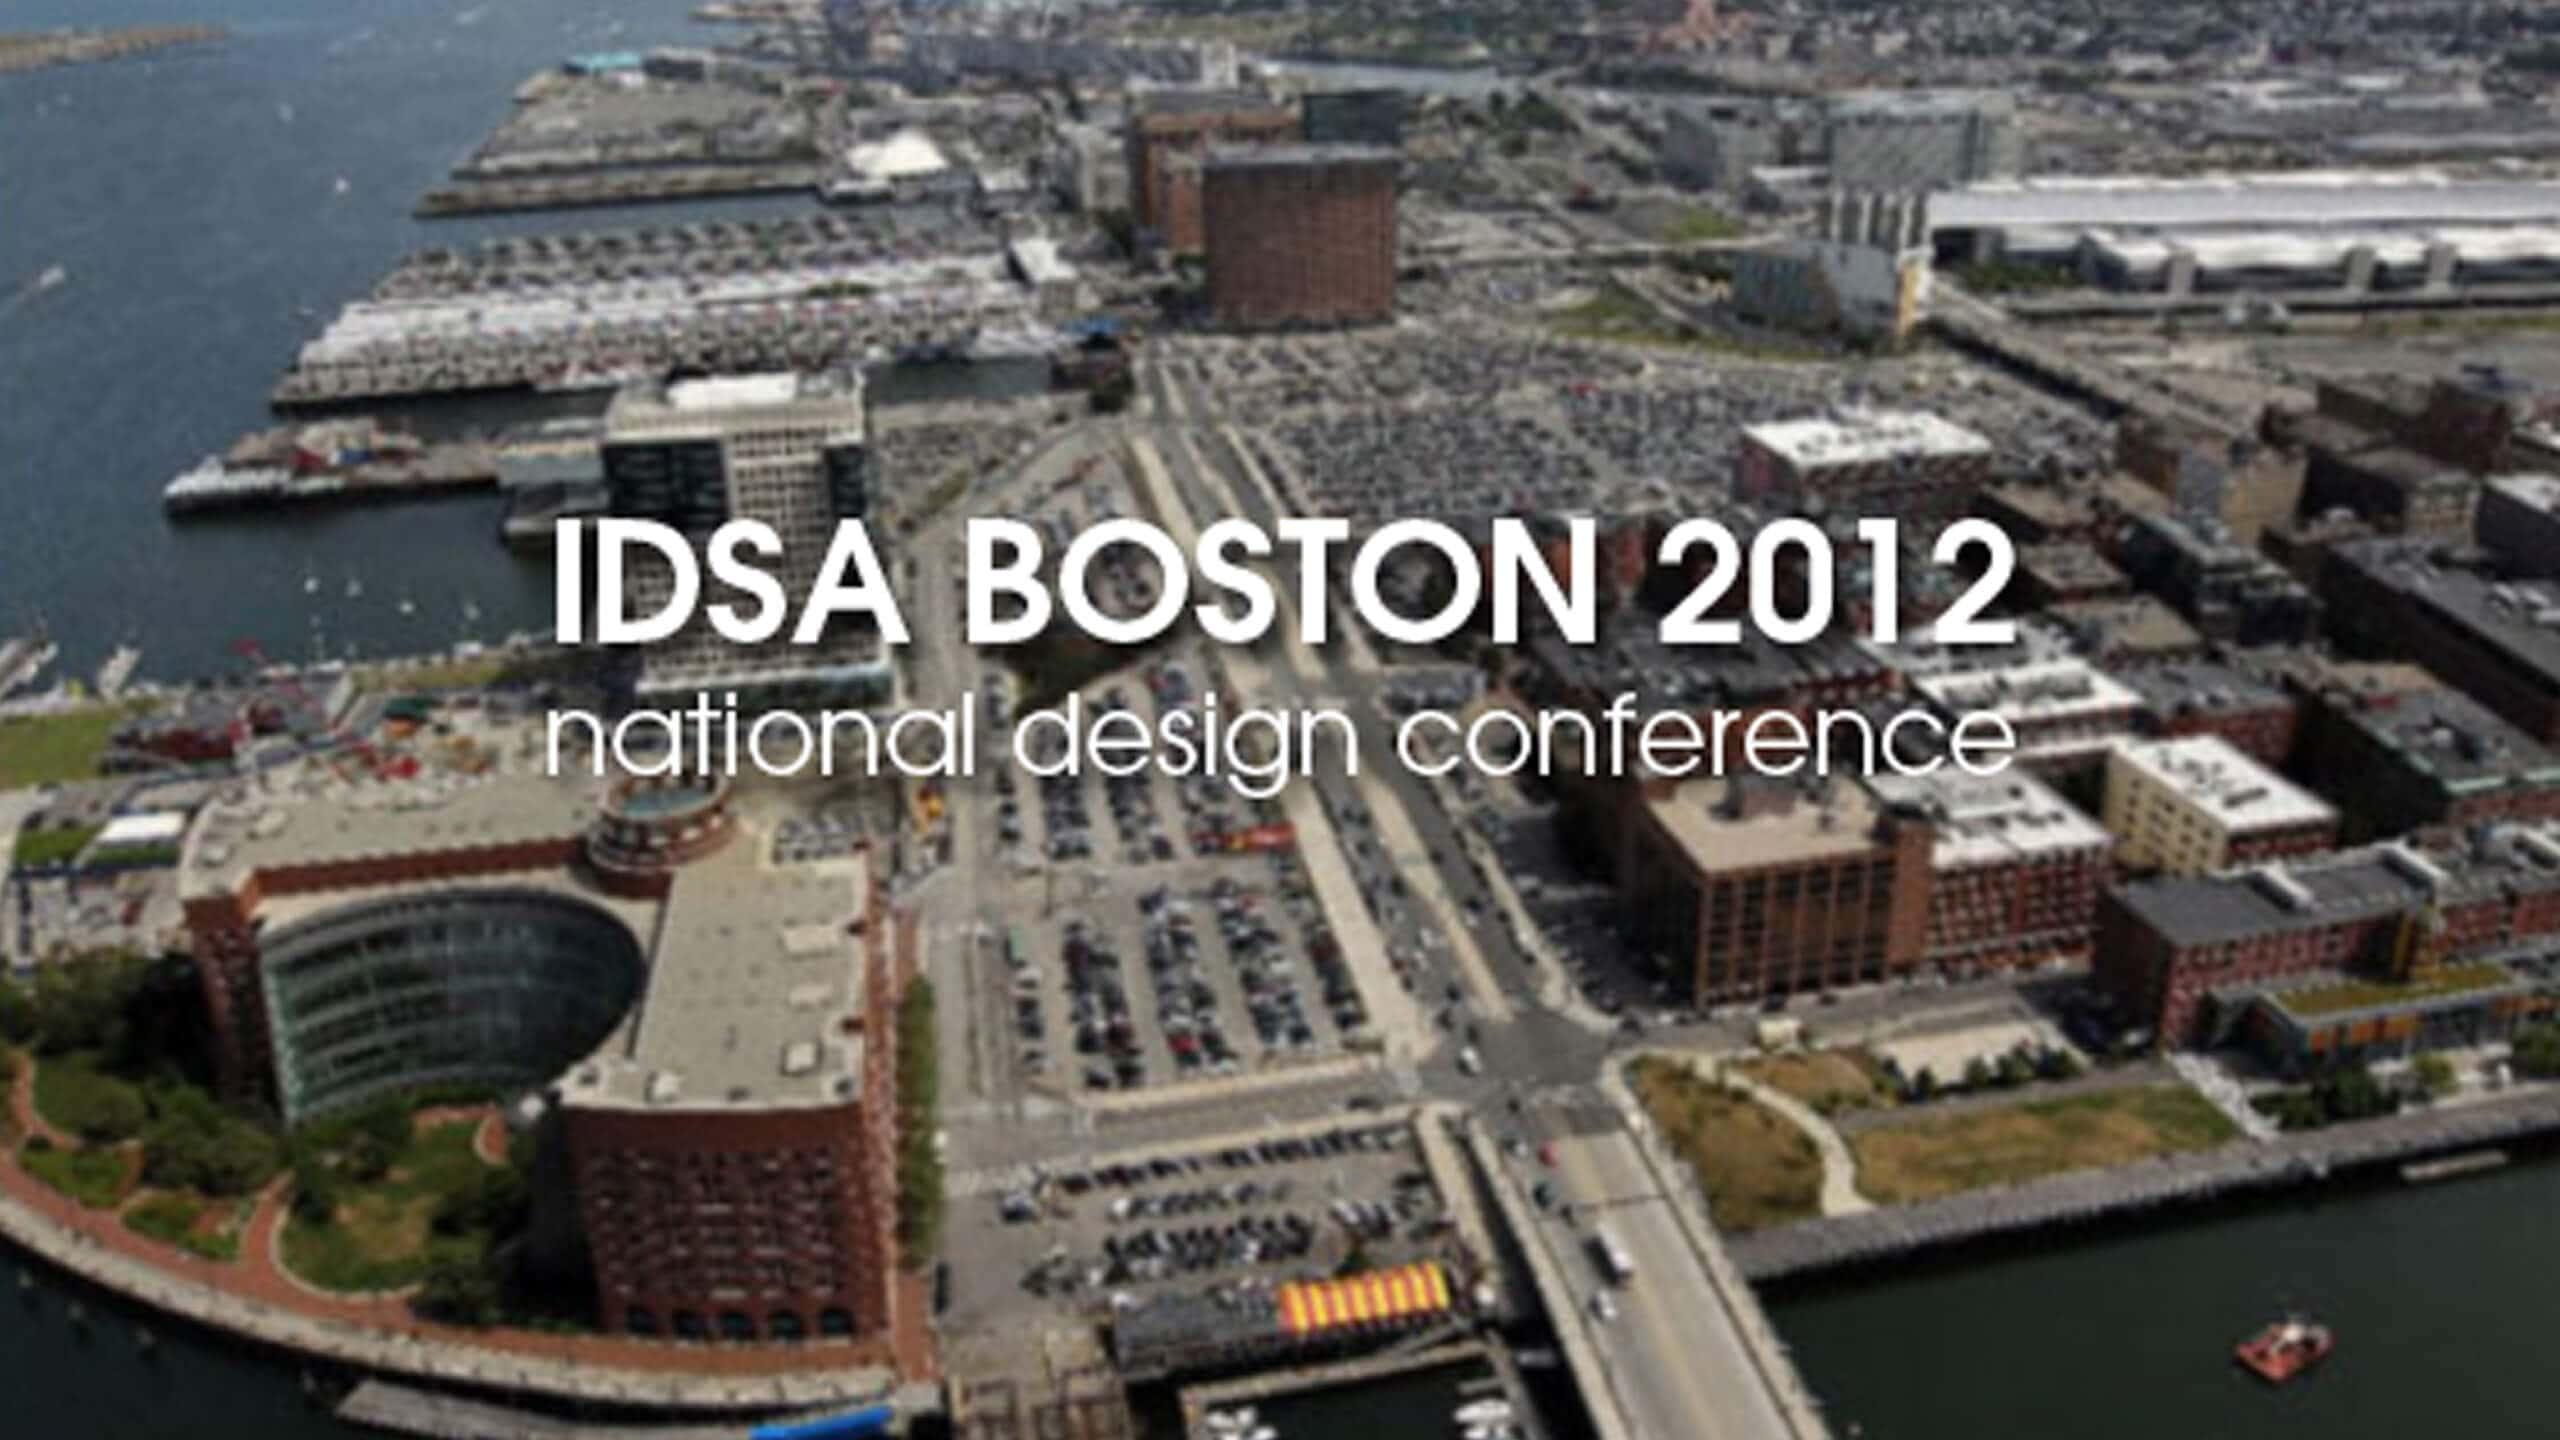 IDSA BOSTON 2012